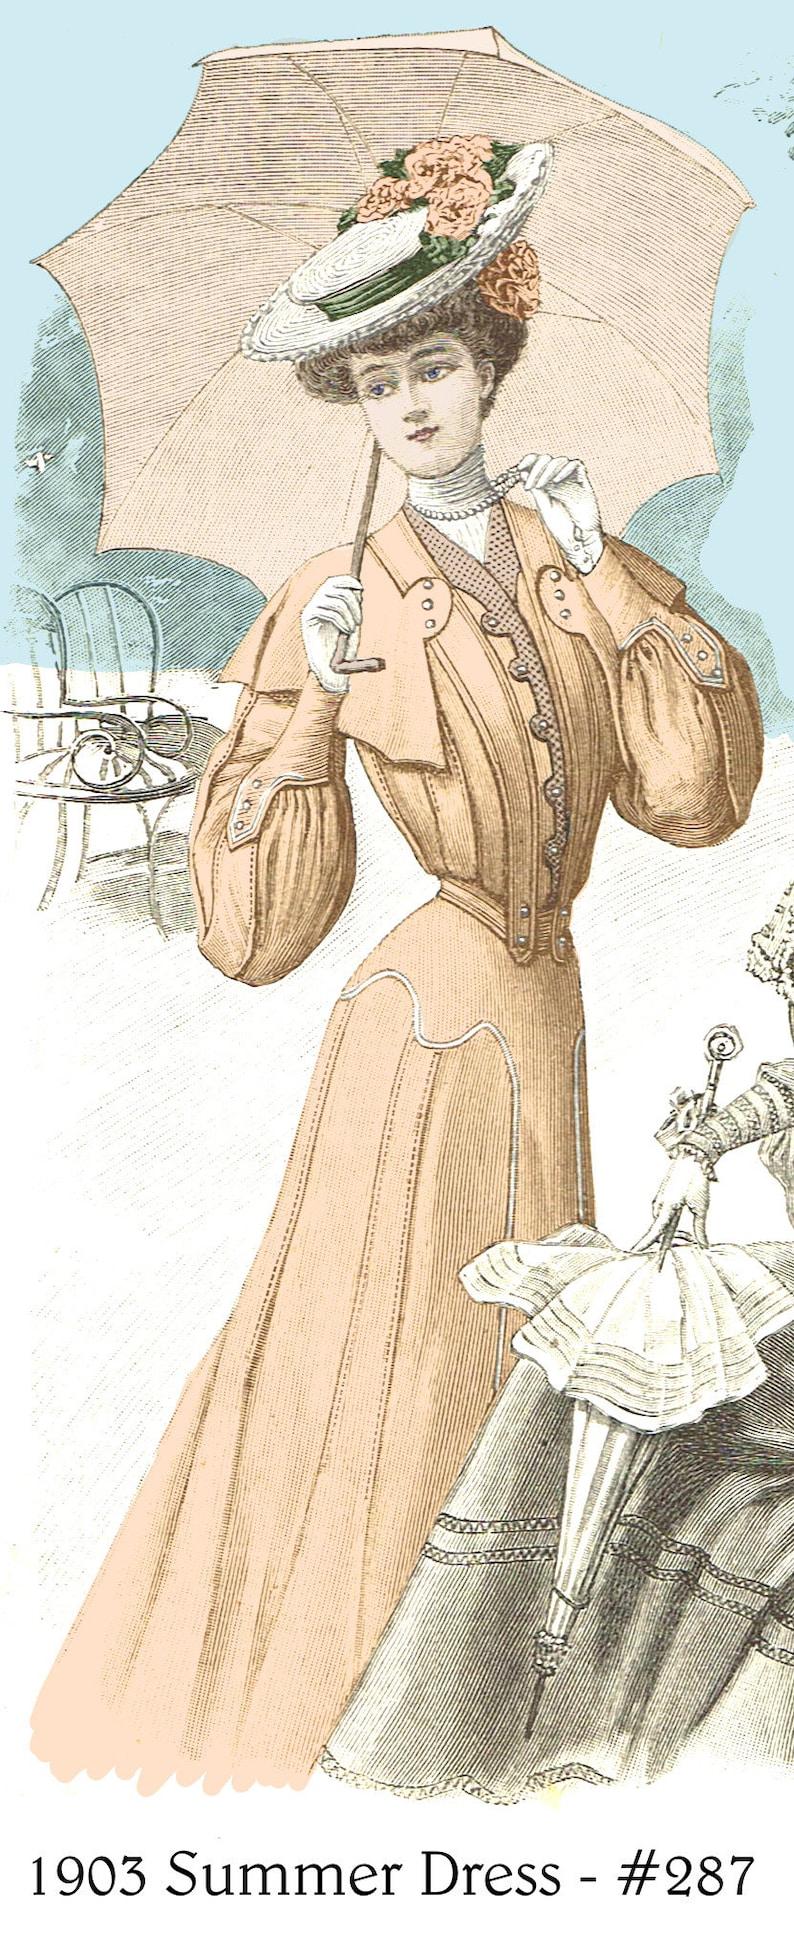 Edwardian Sewing Patterns- Dresses, Skirts, Blouses, Costumes 1903 Summer Dress with unique design pattern - sized for you from antique original - Bonus lingerie patterns. #287 $9.95 AT vintagedancer.com